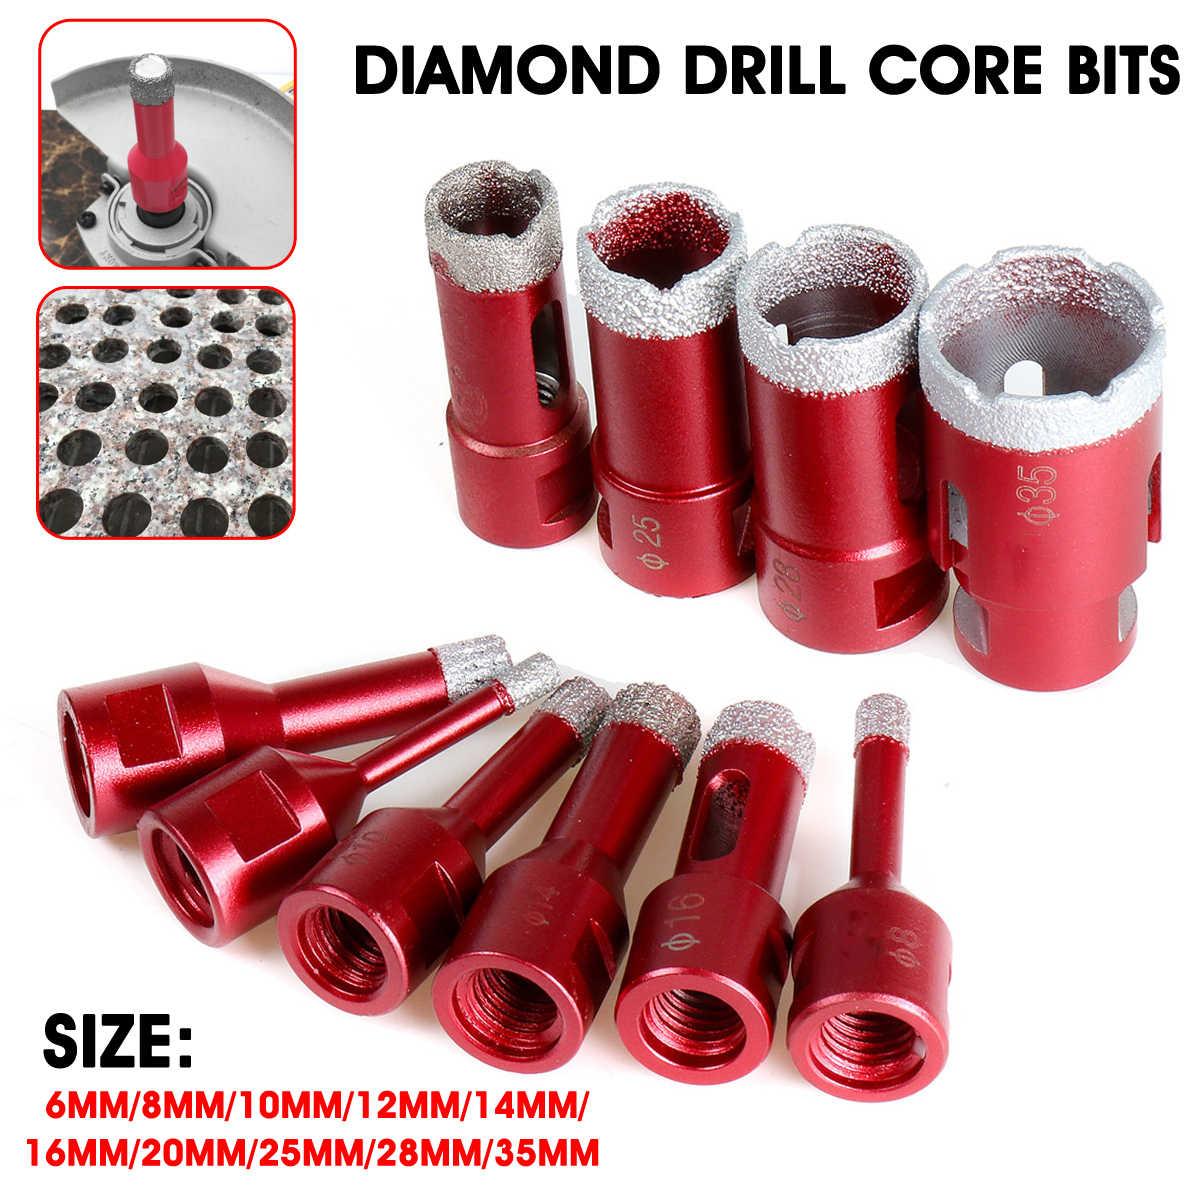 1PC 35MM Marble Opener Diamond Core Bit Hole Saw Drill Bit For Marble Granite